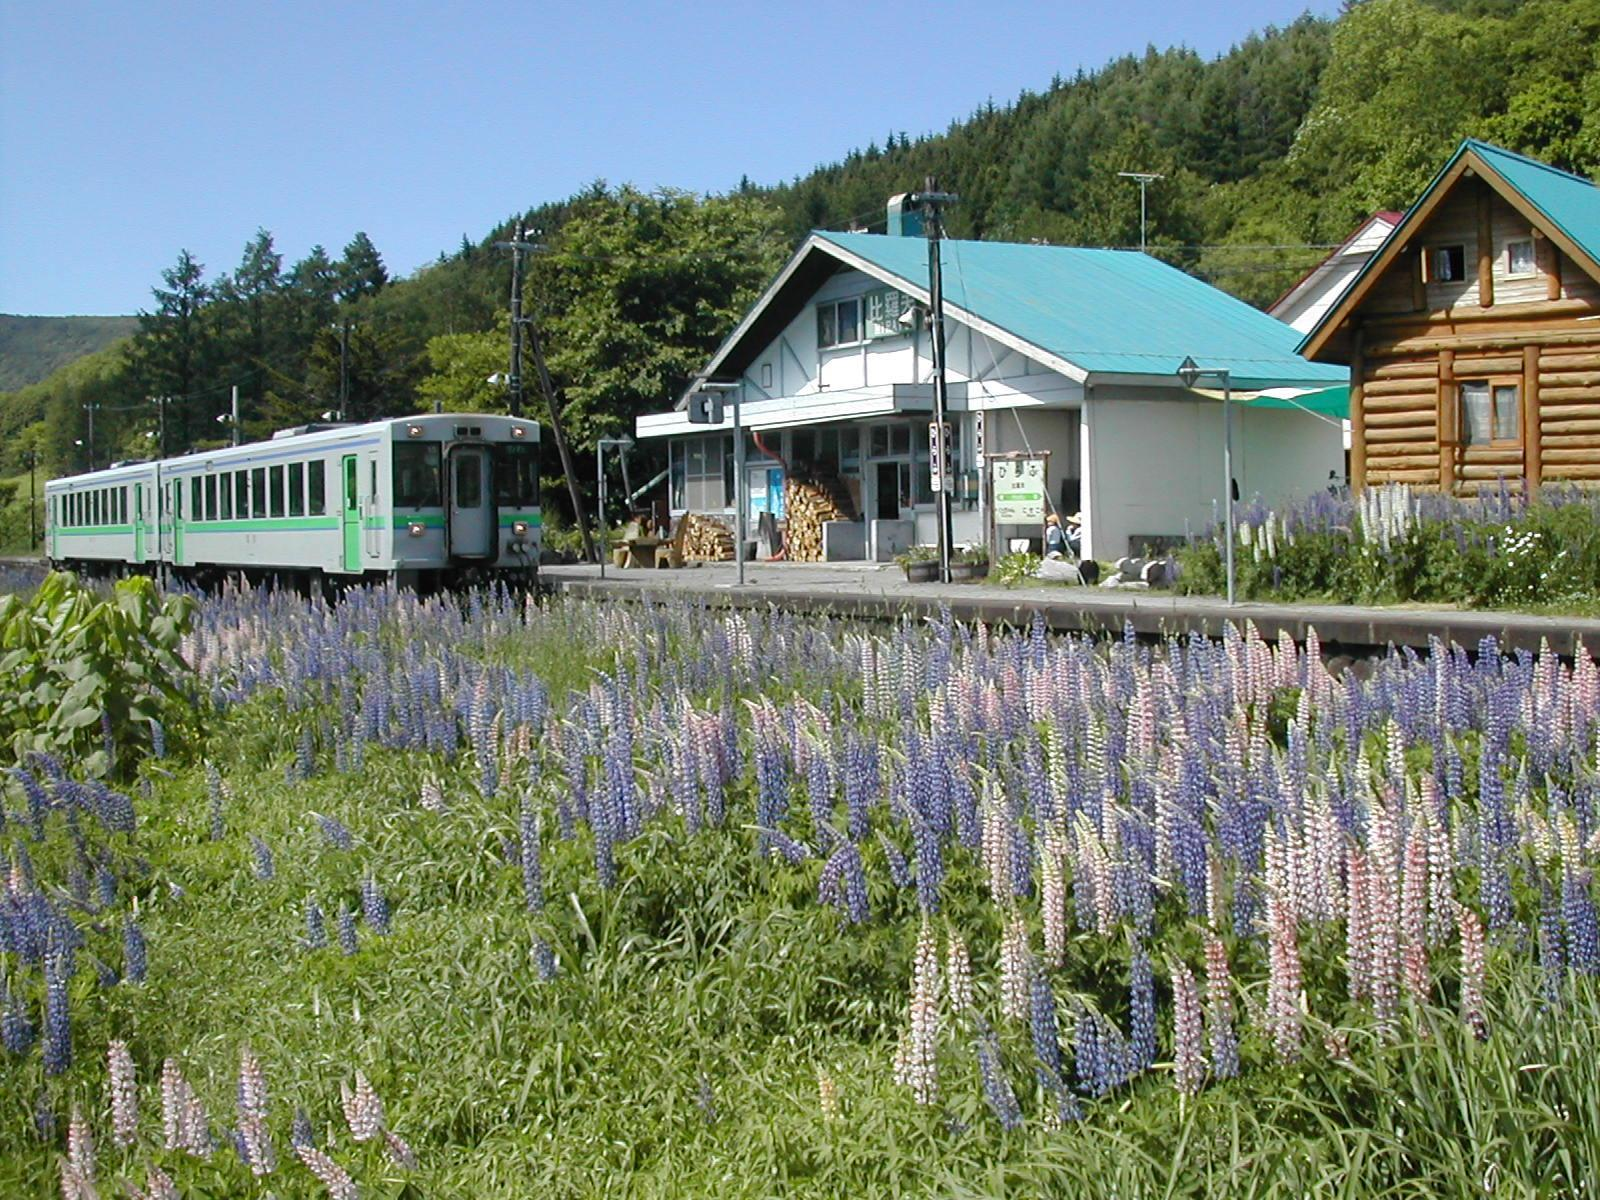 站之宿比羅夫 Hirafu Station Guest House (Eki no Yado Hirafu)